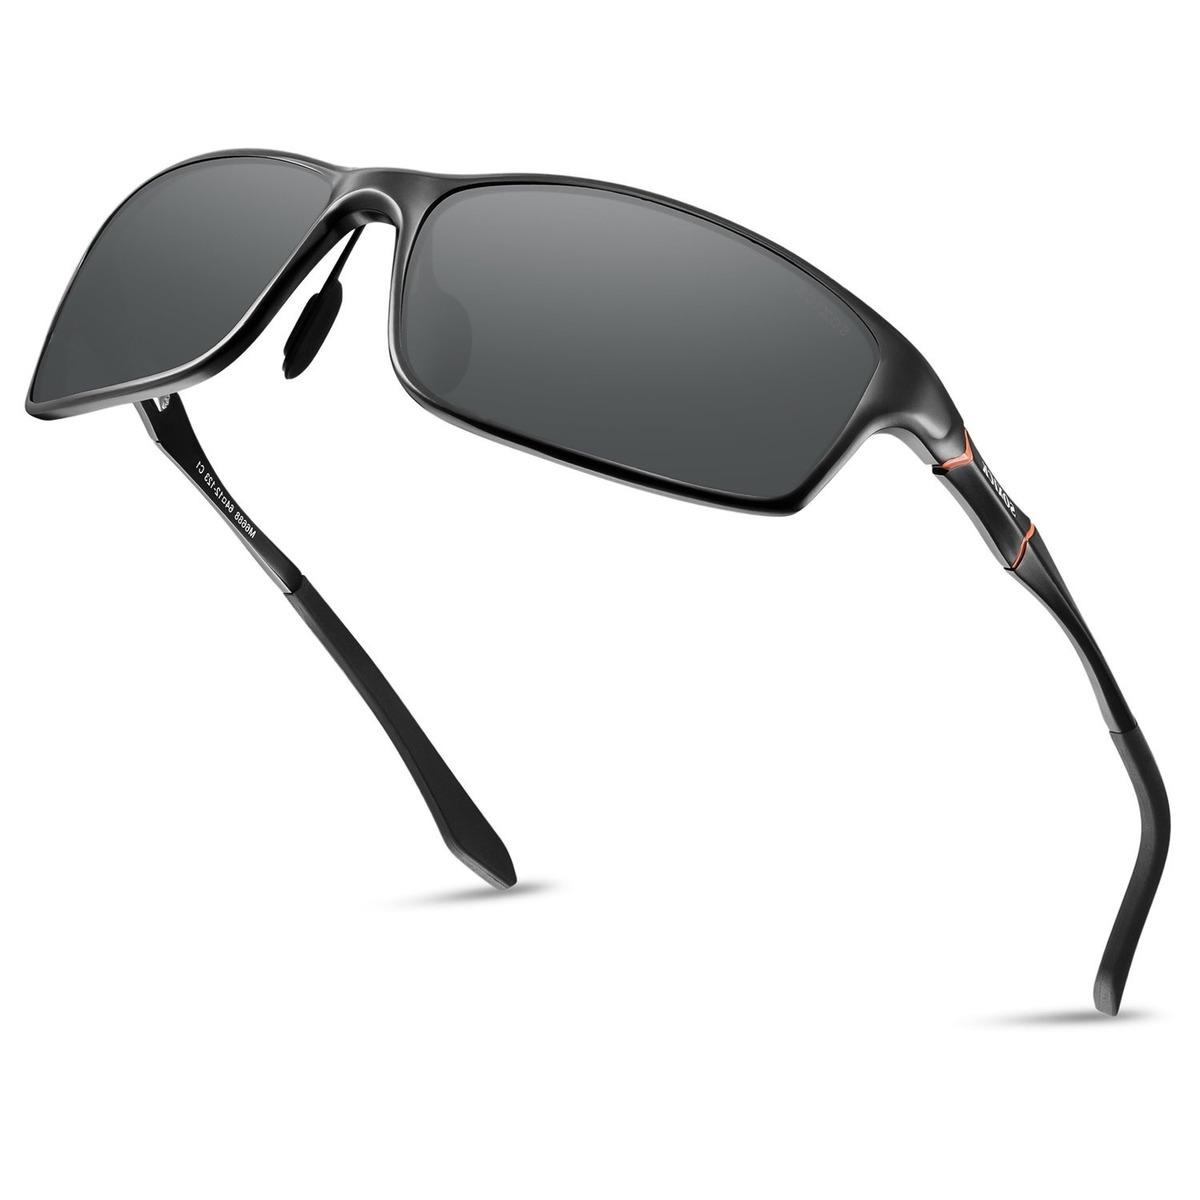 fa3acbb4d0 Uv400 Los Soxick G s Polarizadas 71 U Hombres Sol Gafas De 8XkPONn0w